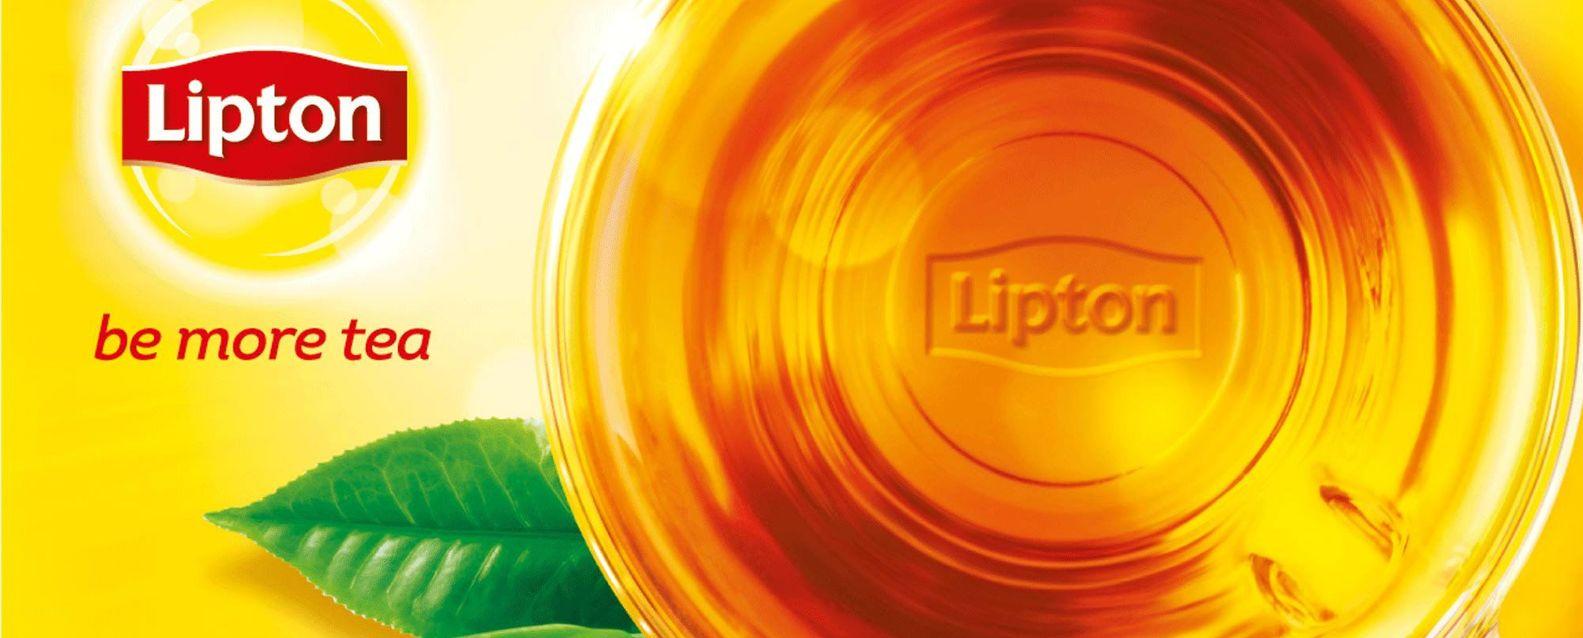 Cup of Lipton tea